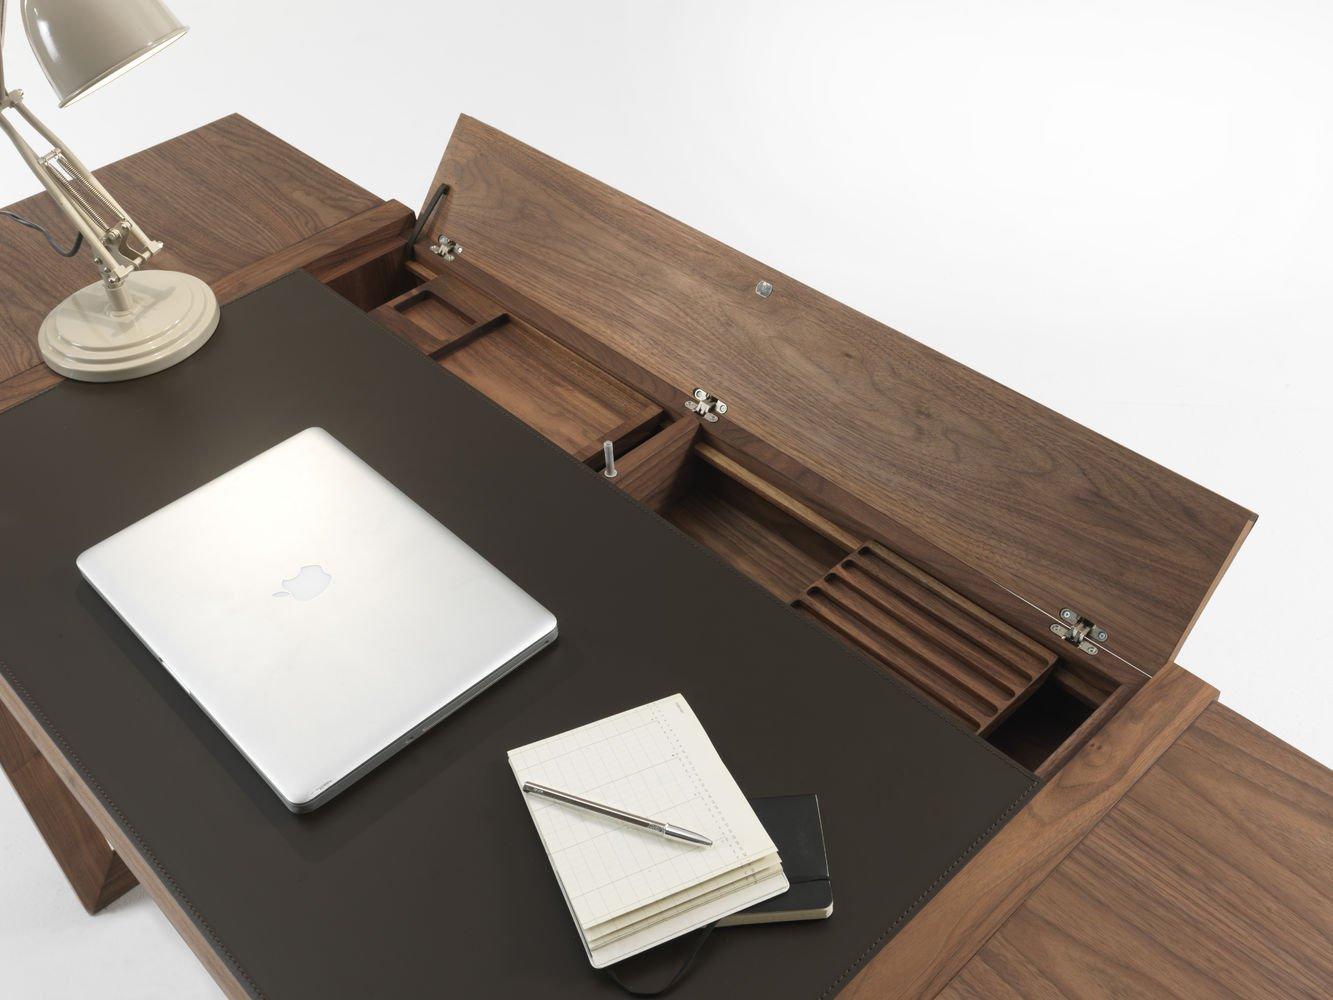 Elle Ecrit desk from Riva 1920